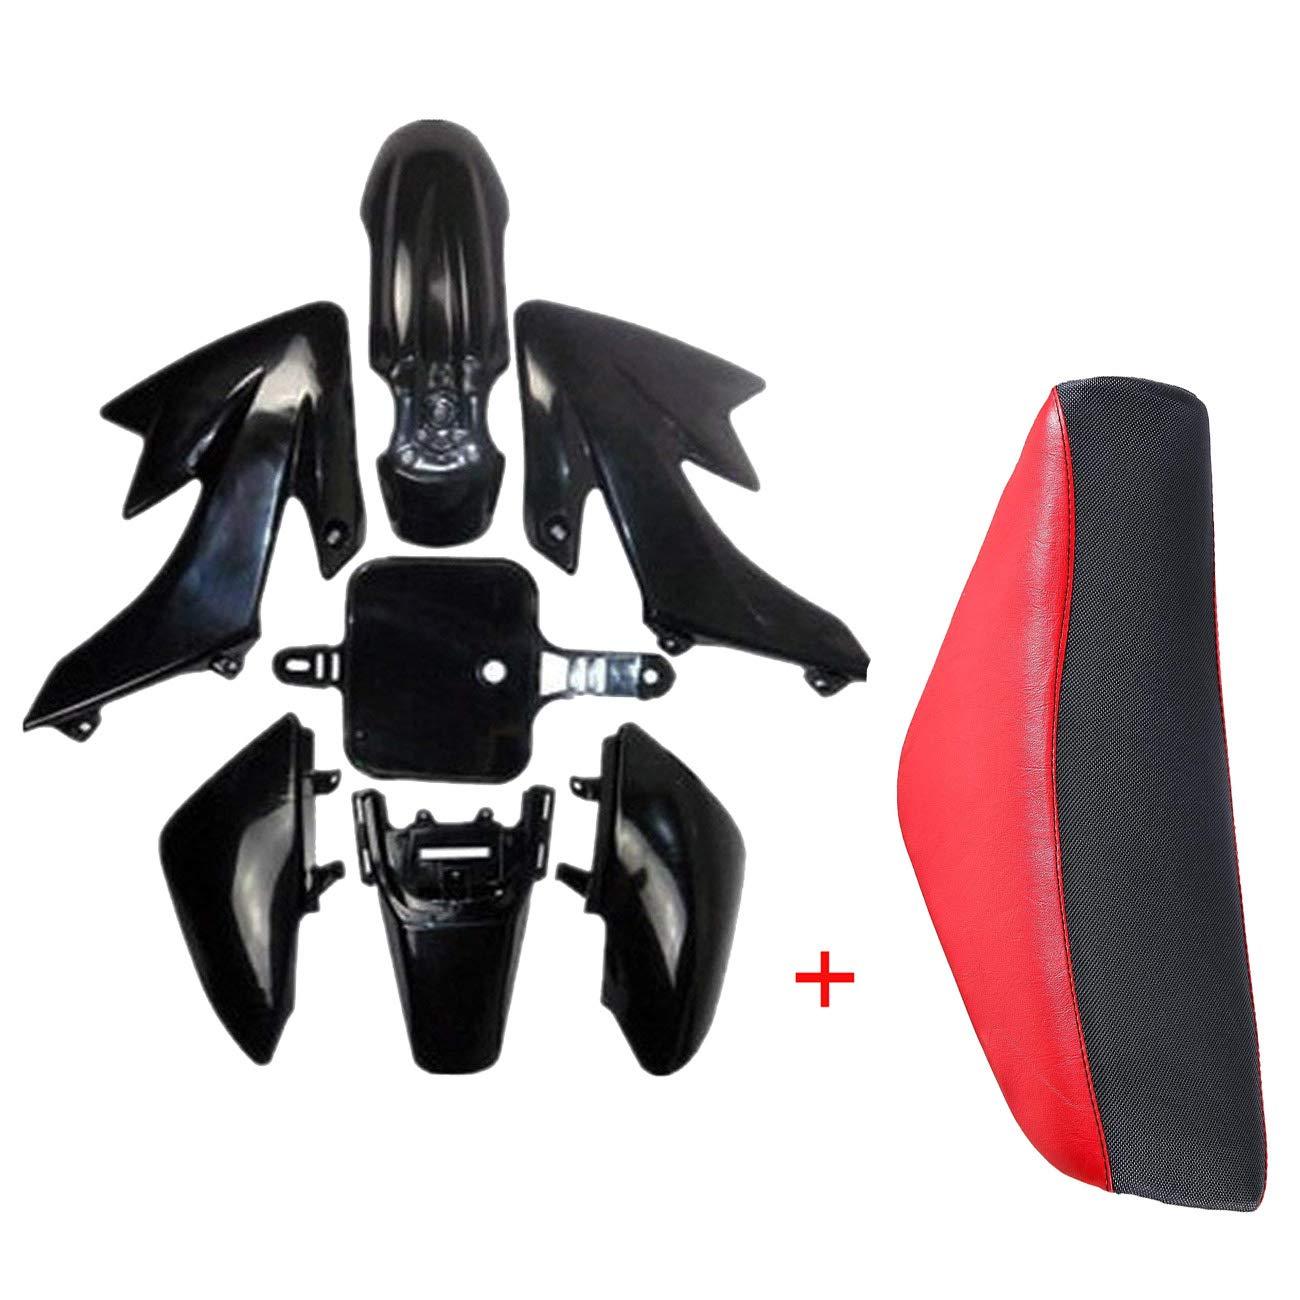 Black JCMOTO Plastic Body Fairing Kit and Tall Seat For CRF XR CRF50 XR50 50s 50cc 70cc 110cc 125cc Dirt Pit Bike